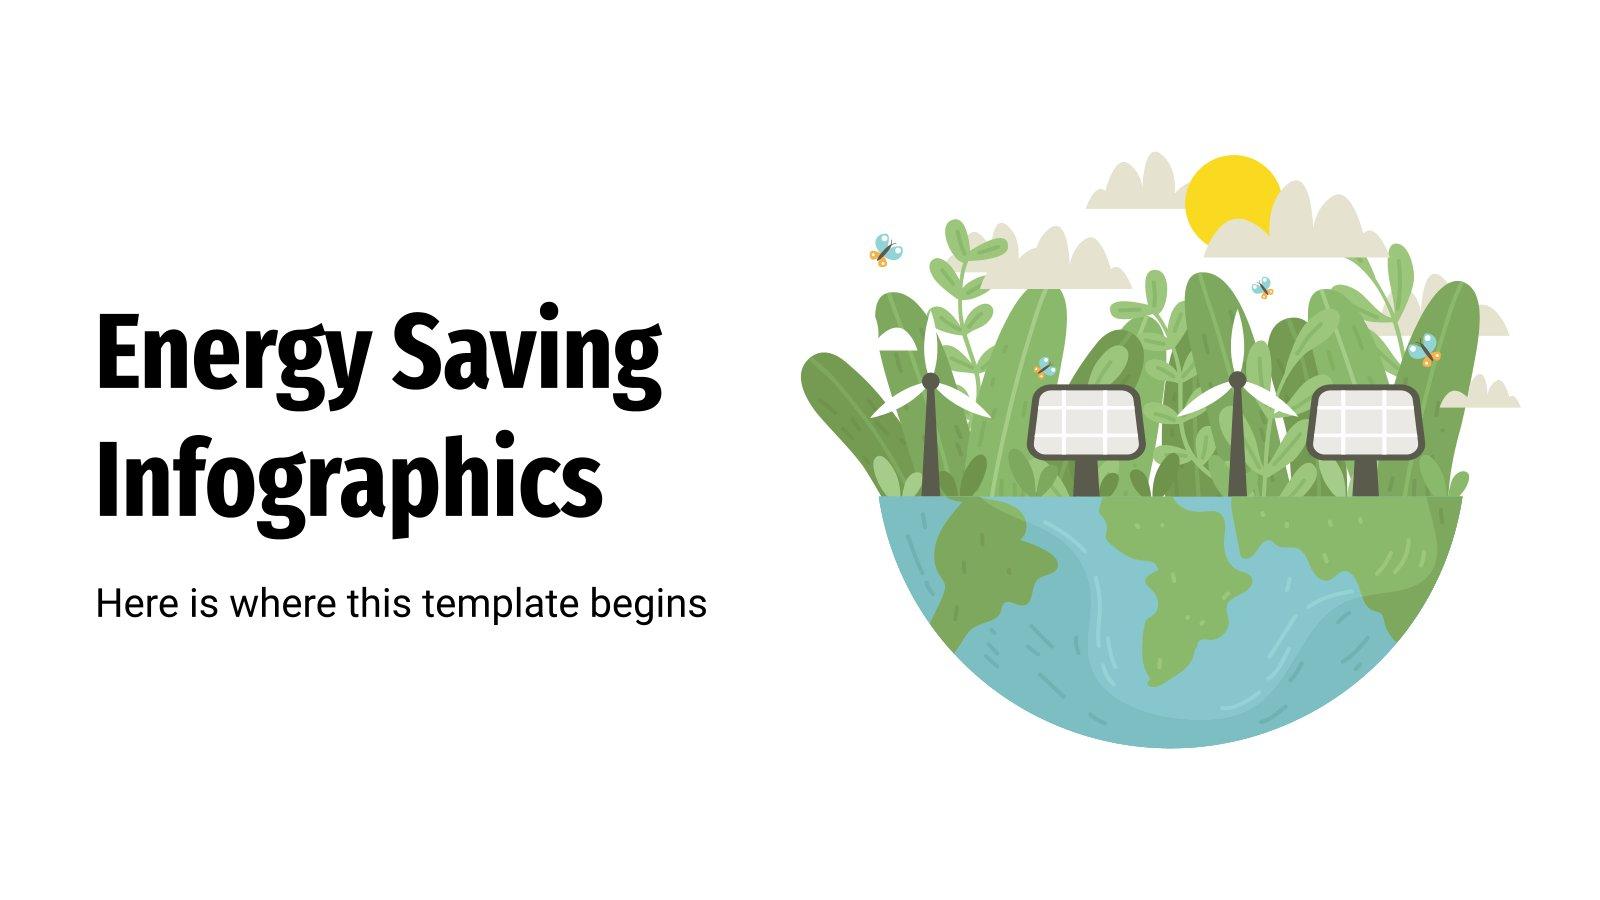 Energy Saving Infographics presentation template